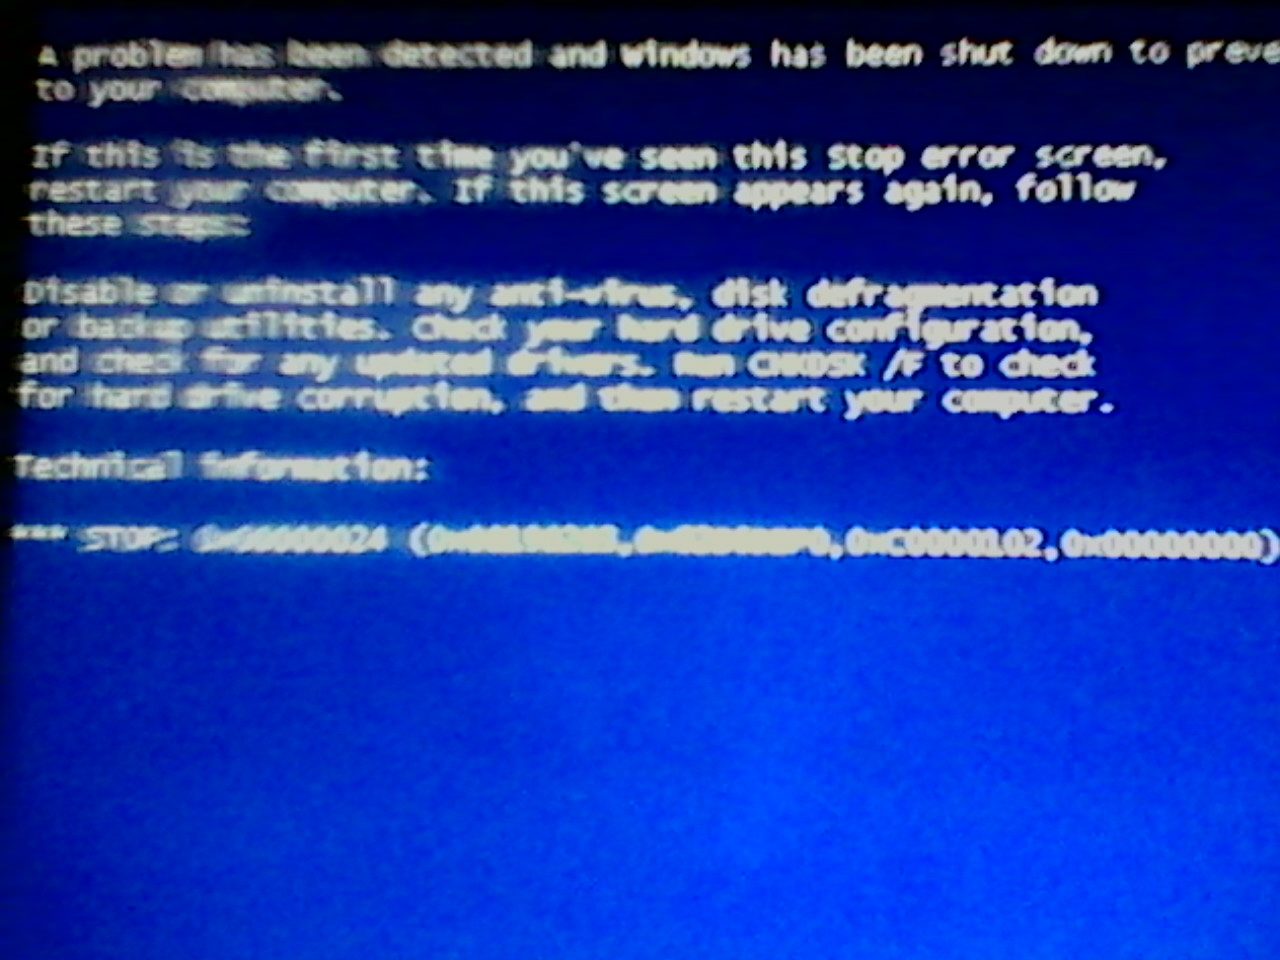 MySQL Fatal Error 65